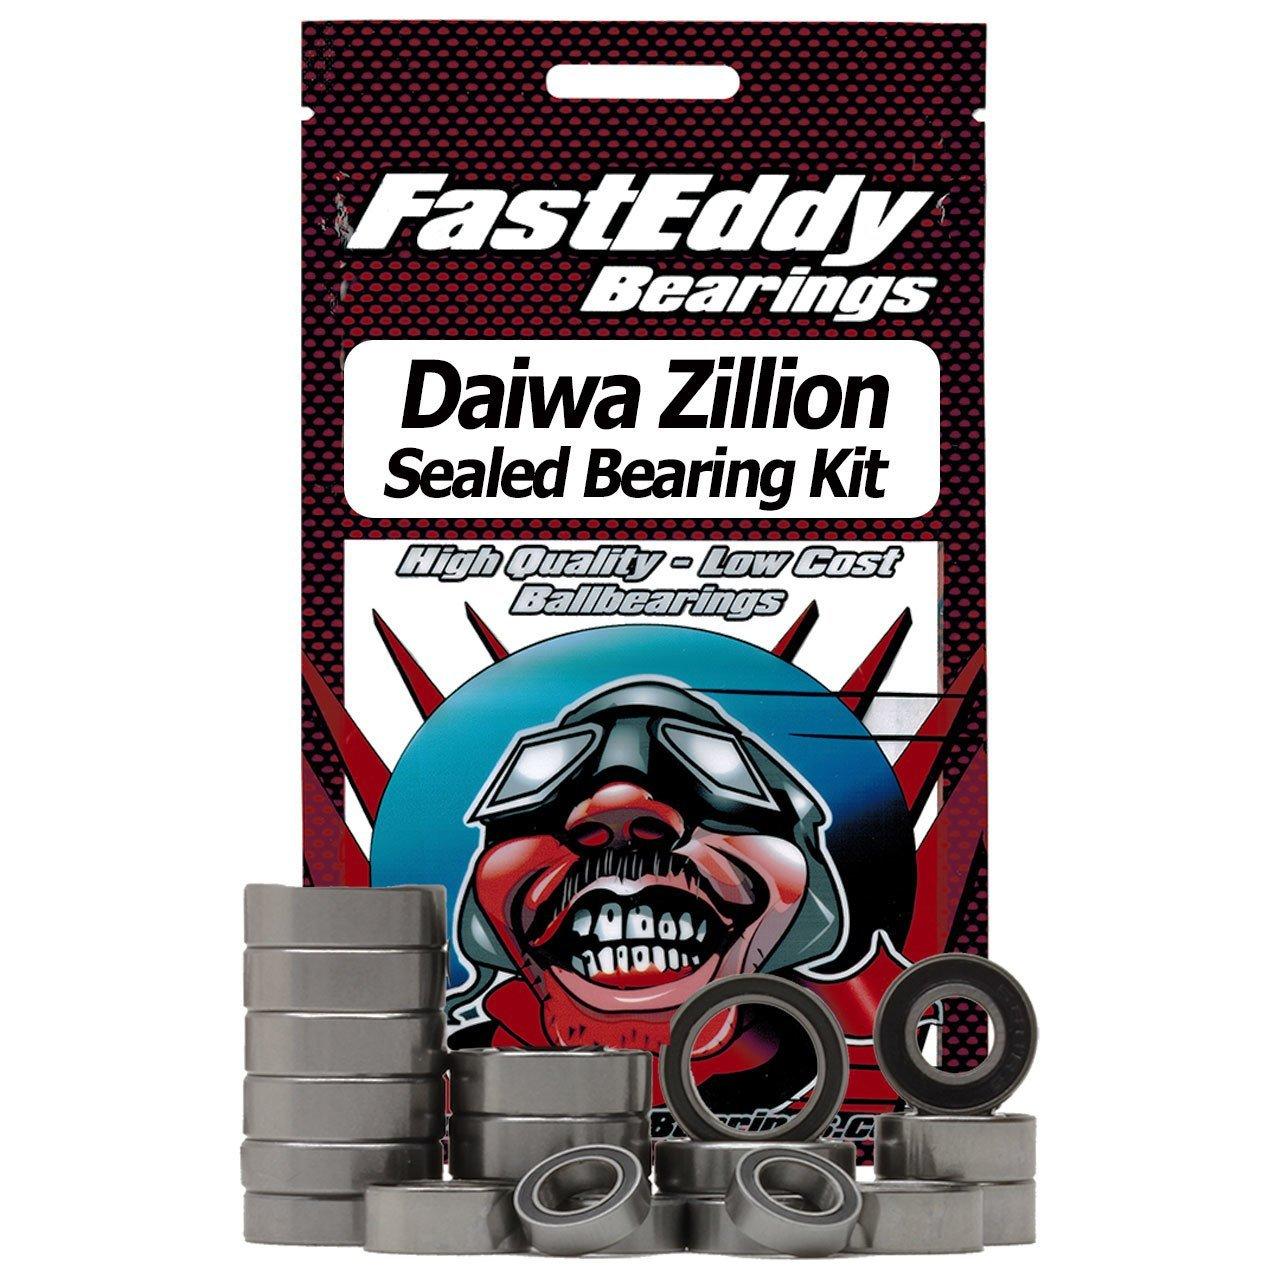 3 DAIWA REEL PART Daiwa Zillion TDZ 105HL Smooth Drag Carbontex Washers #SDD1